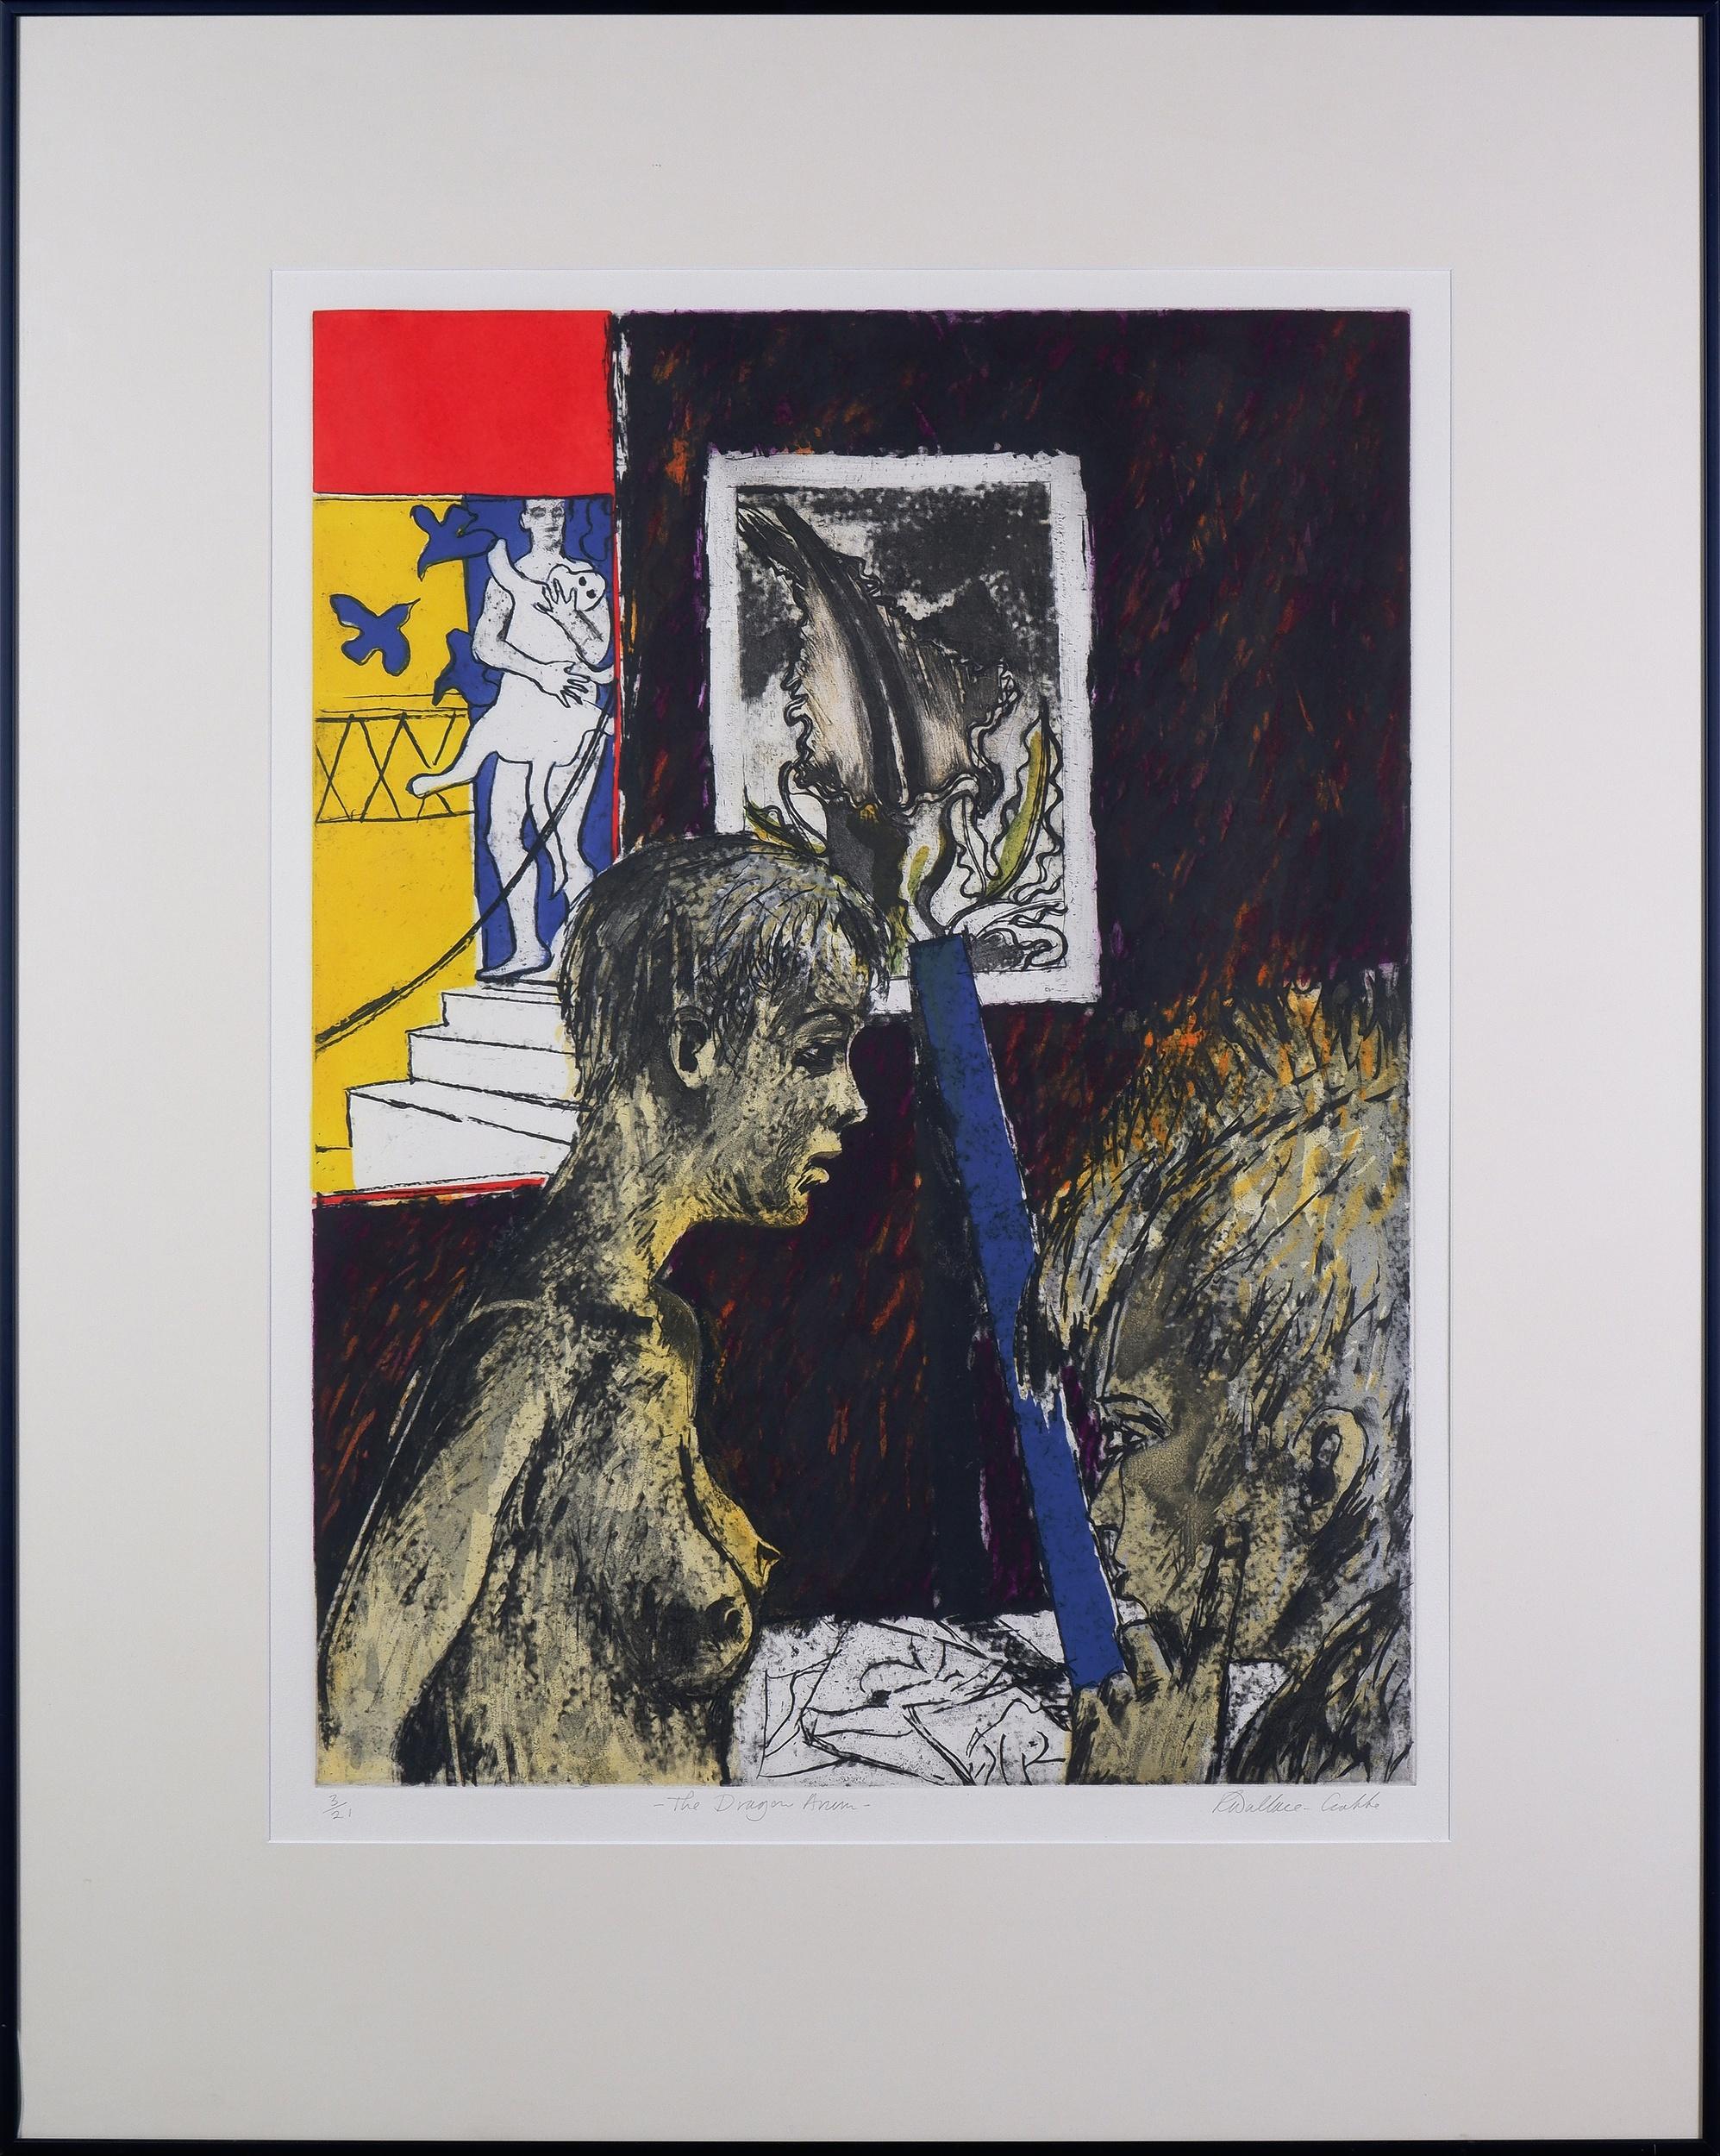 'Robin Wallace-Crabbe (born 1938), The Dragon Arum, Linocut, Edition 3/21, 60 x 45 cm (image size)'